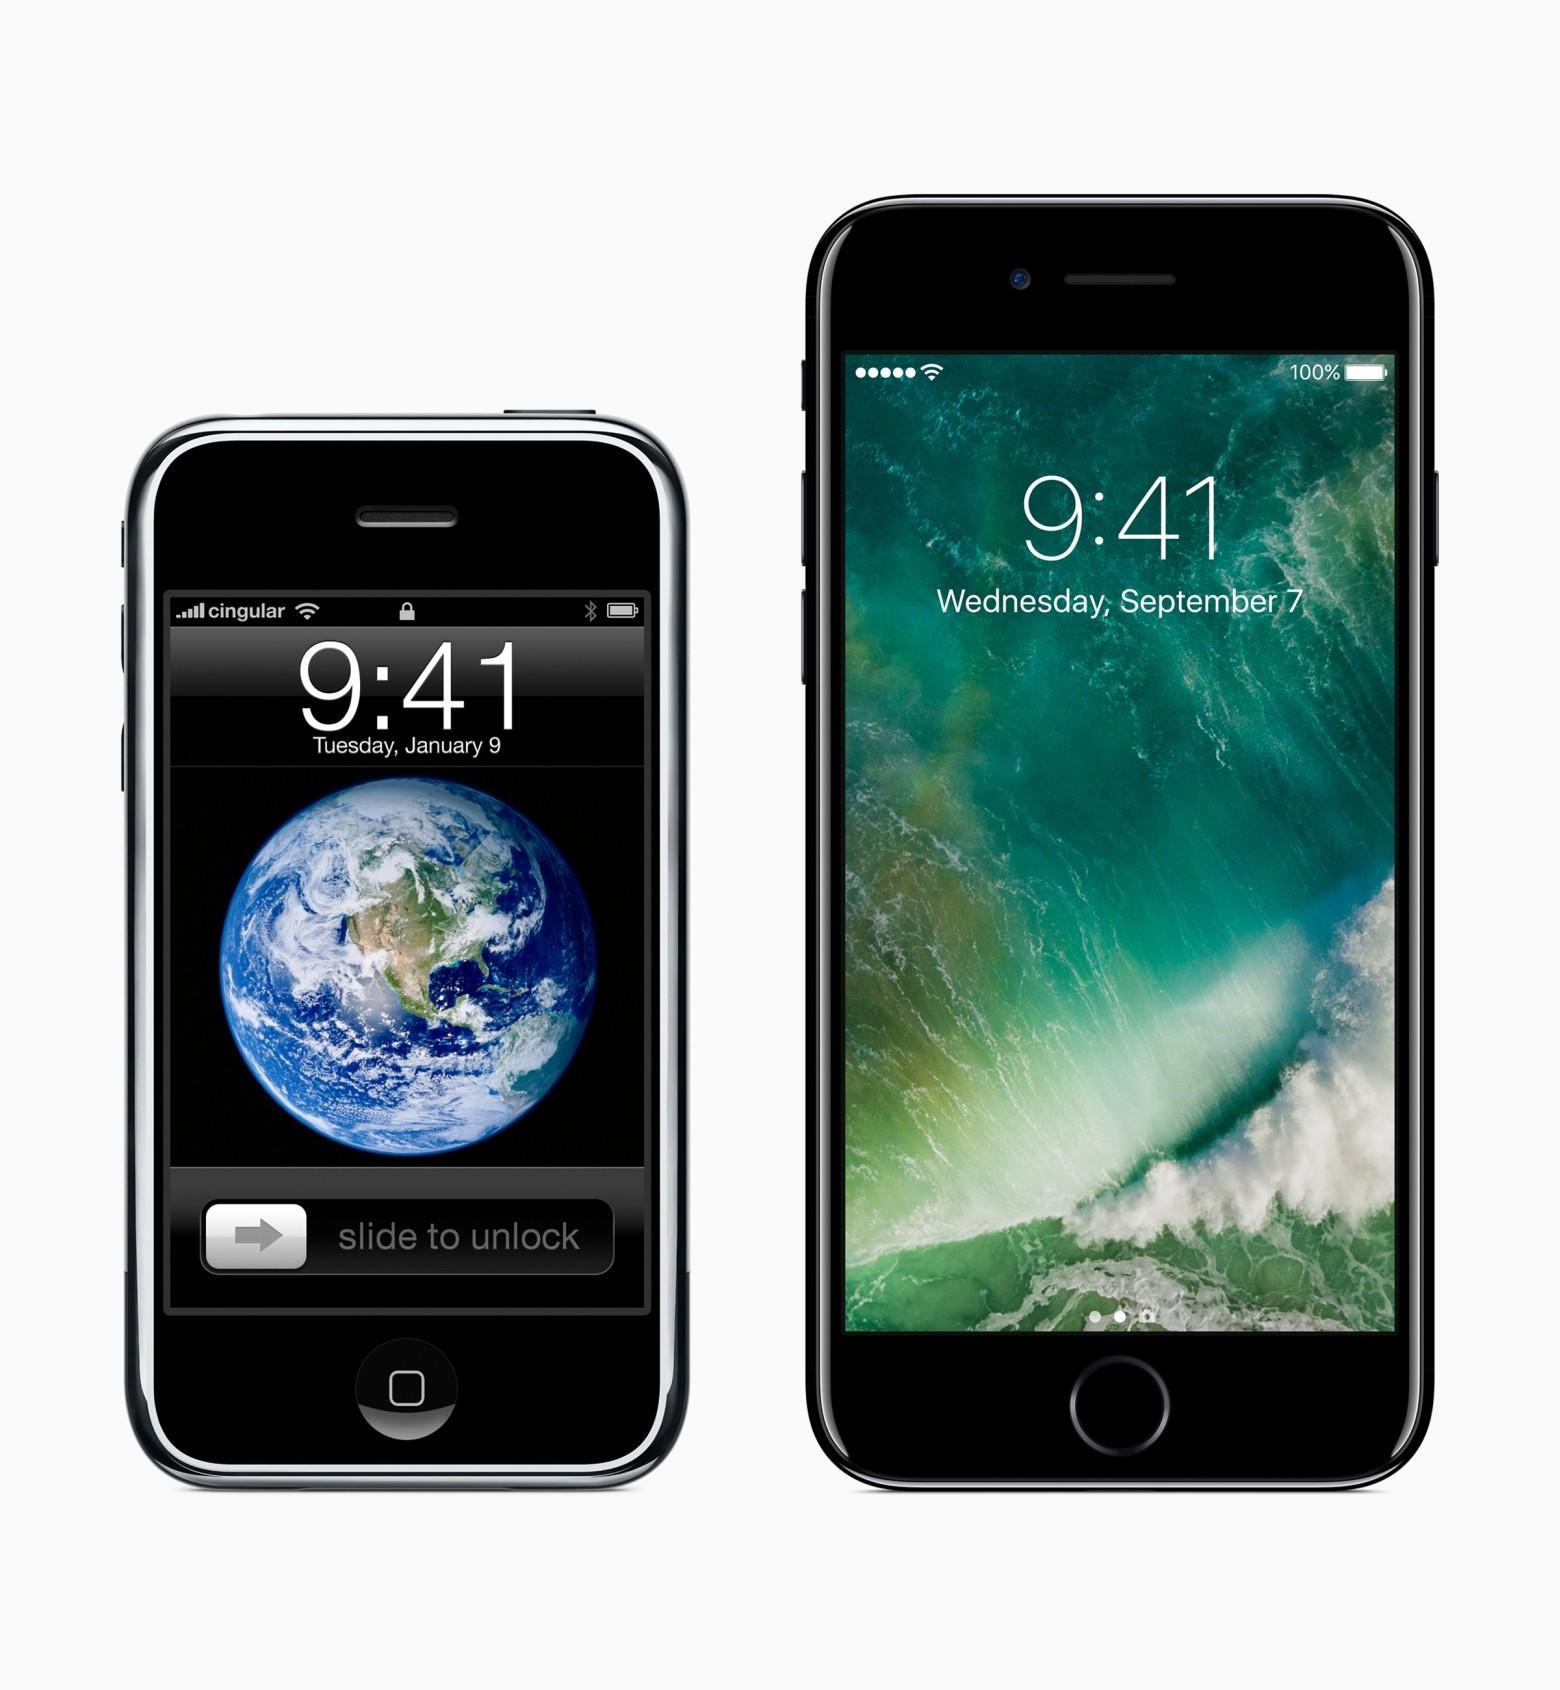 10 лет назад мир увидел iPhone - 3